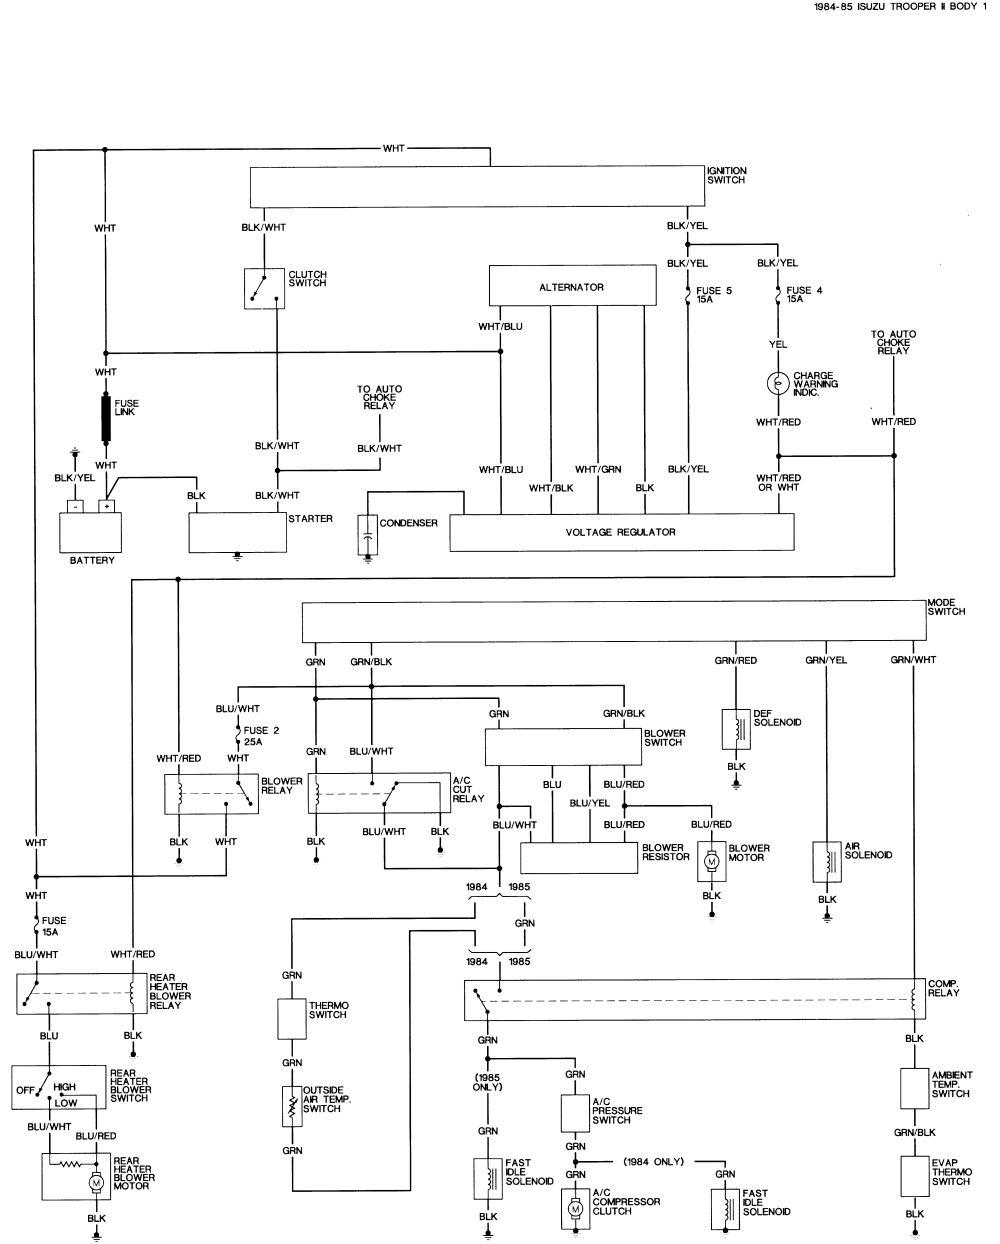 Isuzu Rodeo Radio 6cd Wiring Diagram name Rodeo